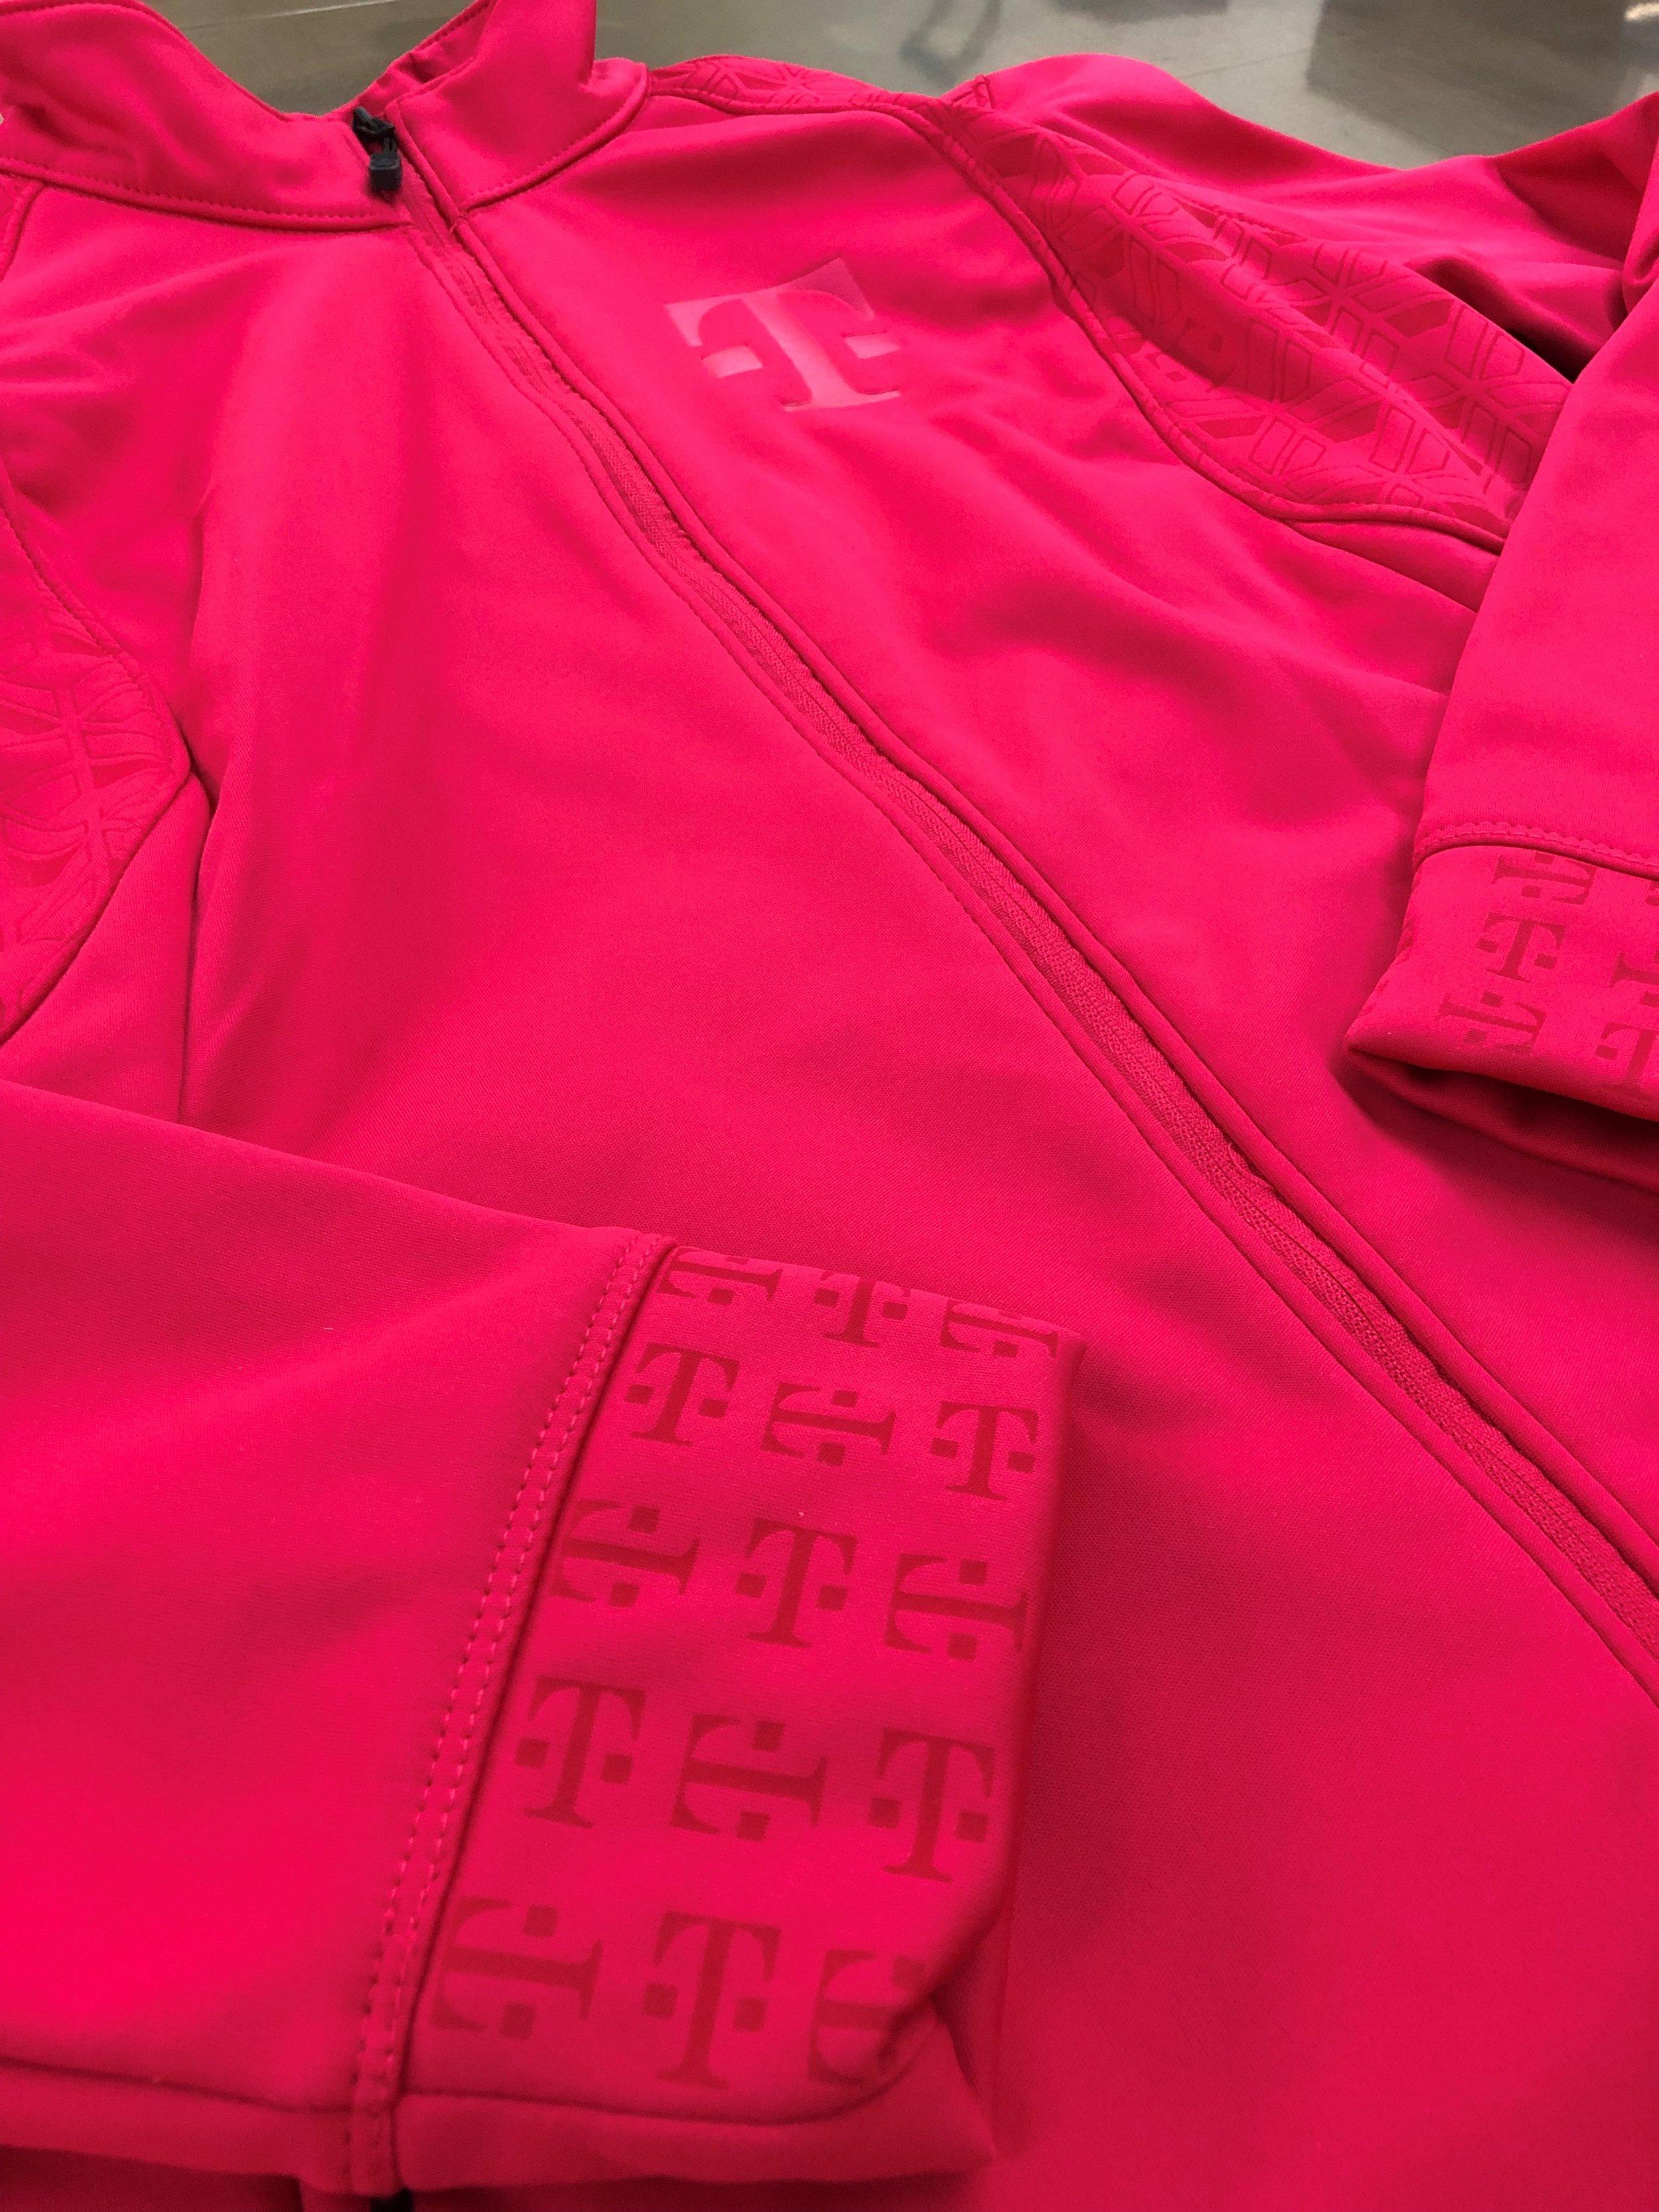 logounltd_laser_embroidery_screen_printing_apparel_uniform_custom_tshirts_kirkland_bellevue_seattle_redmond_branded_merchandise_promotional_products_logo_unltd_t_mobile_Tuesday_tmobile_un_carrier_magenta_5G_john_lege (32).jpg